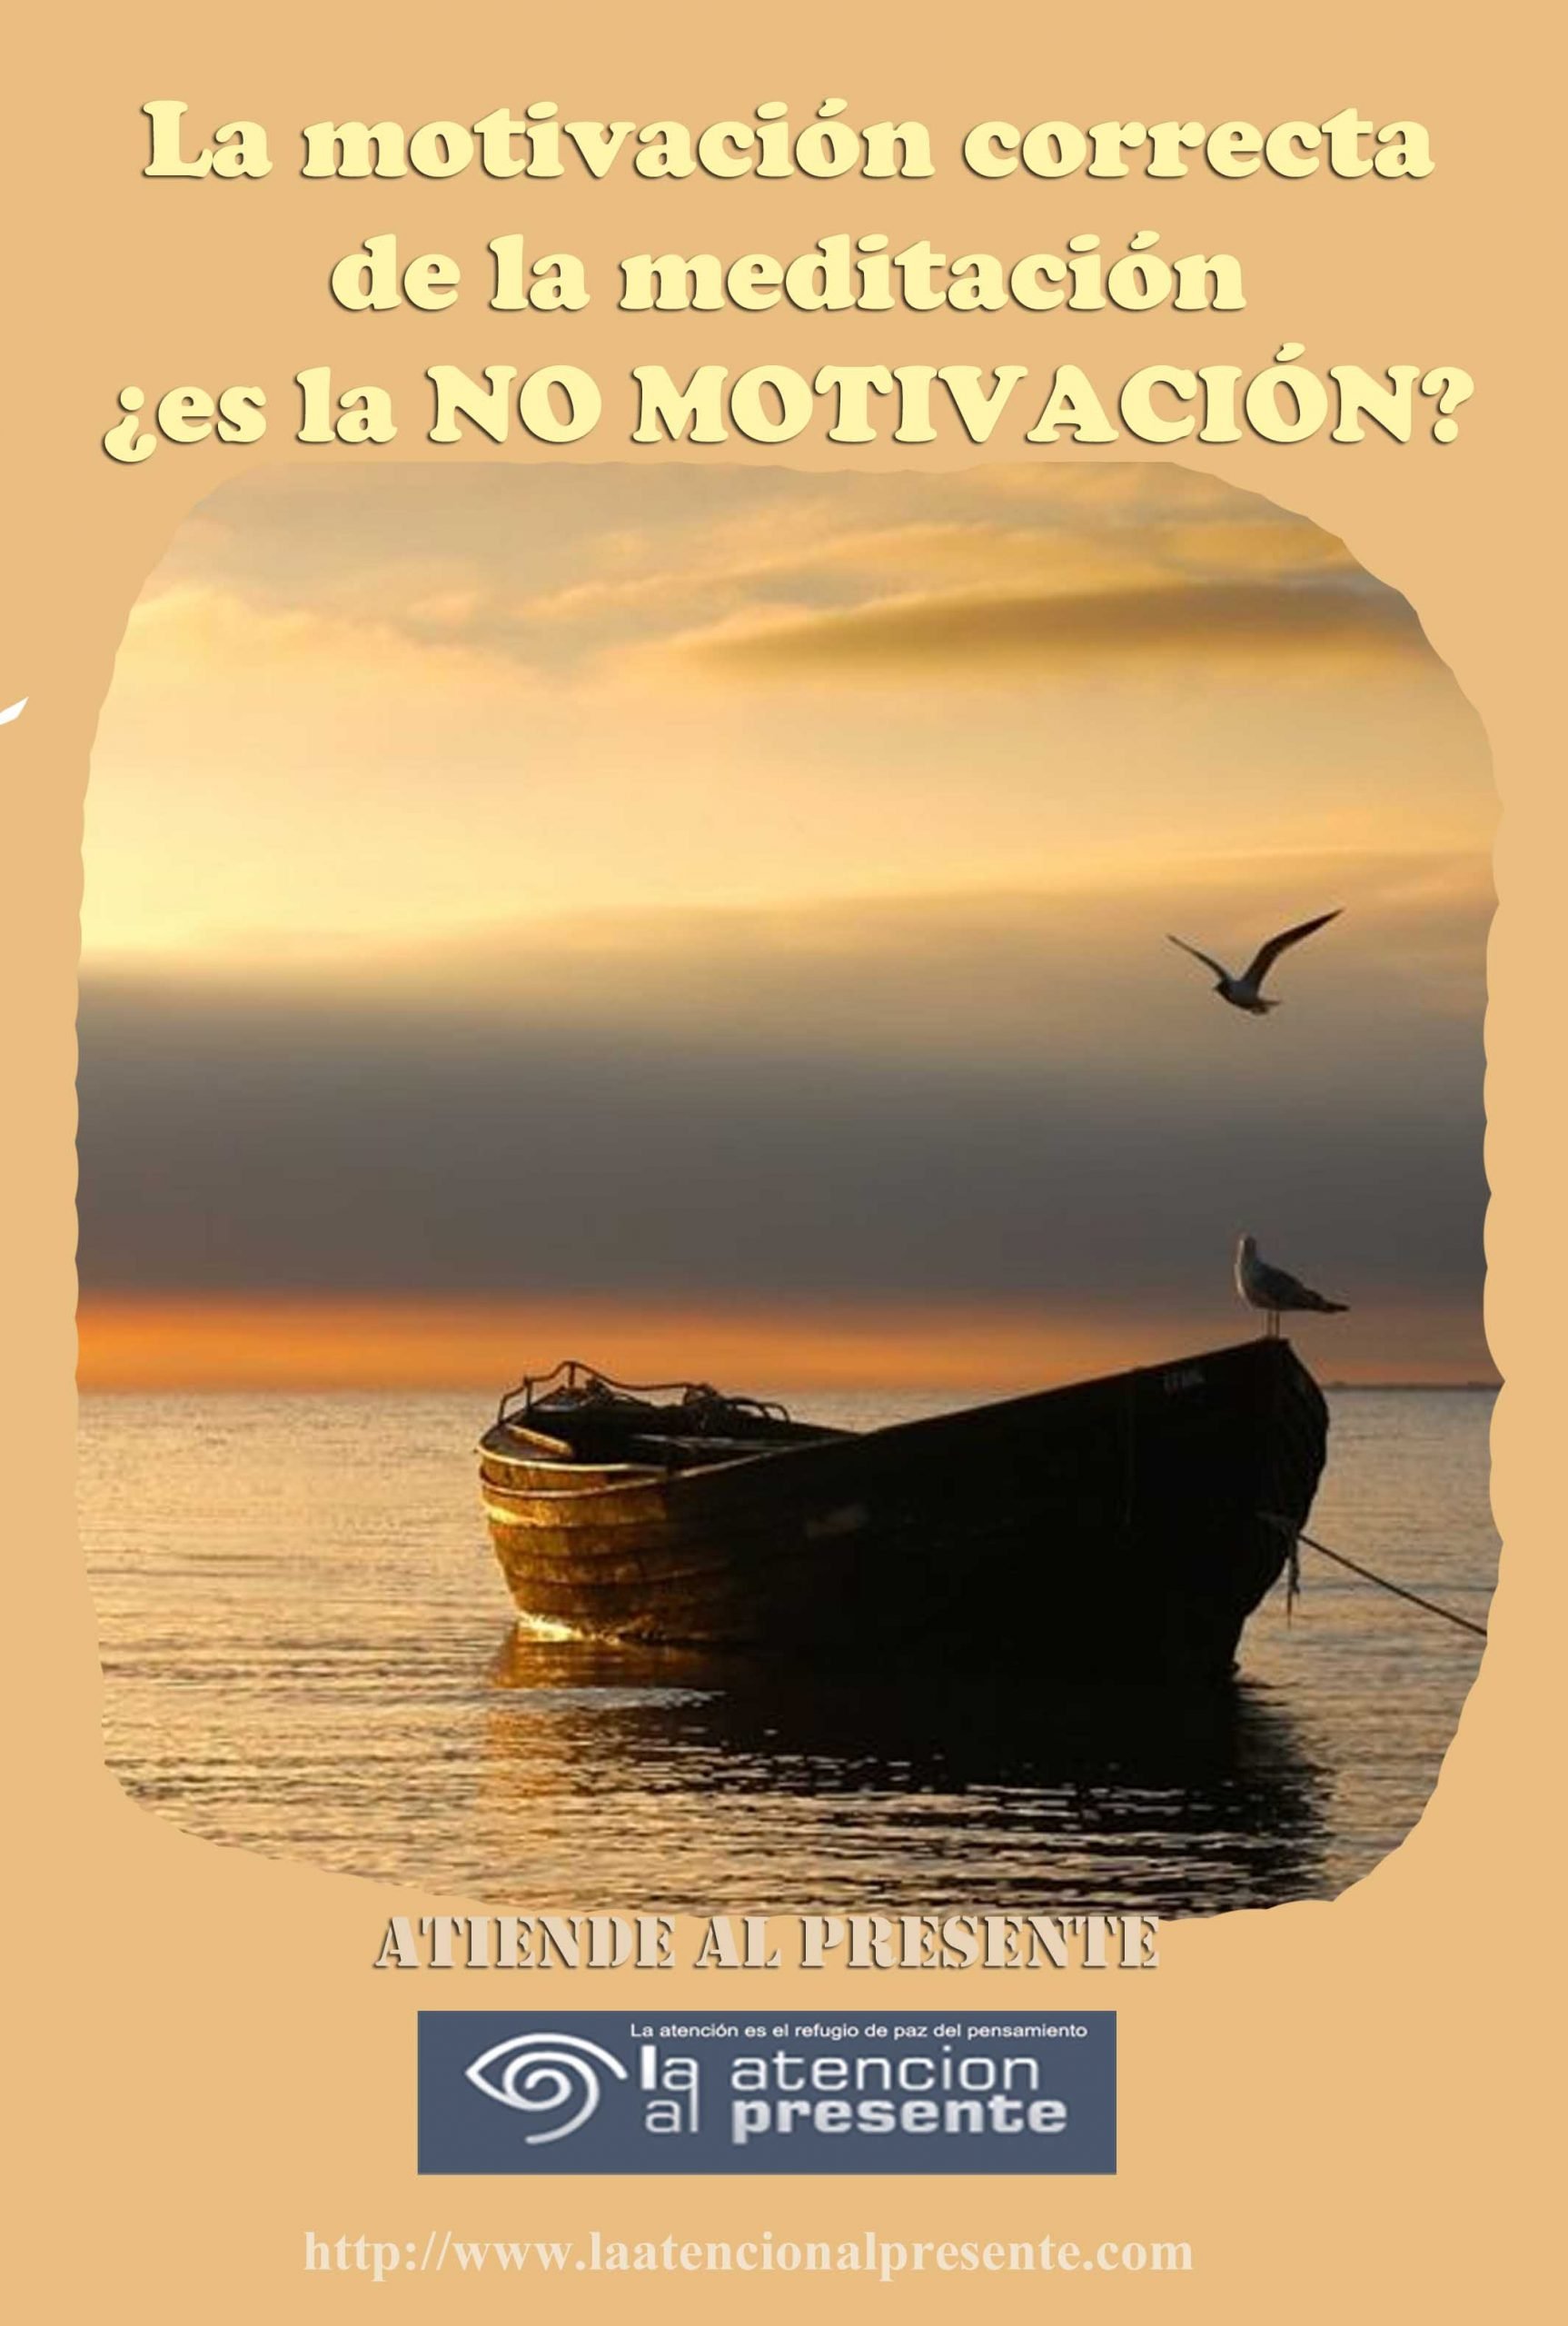 20 de Febrero ISA La motivacion correcta de la meditacion es la NO MOTIVACION min scaled